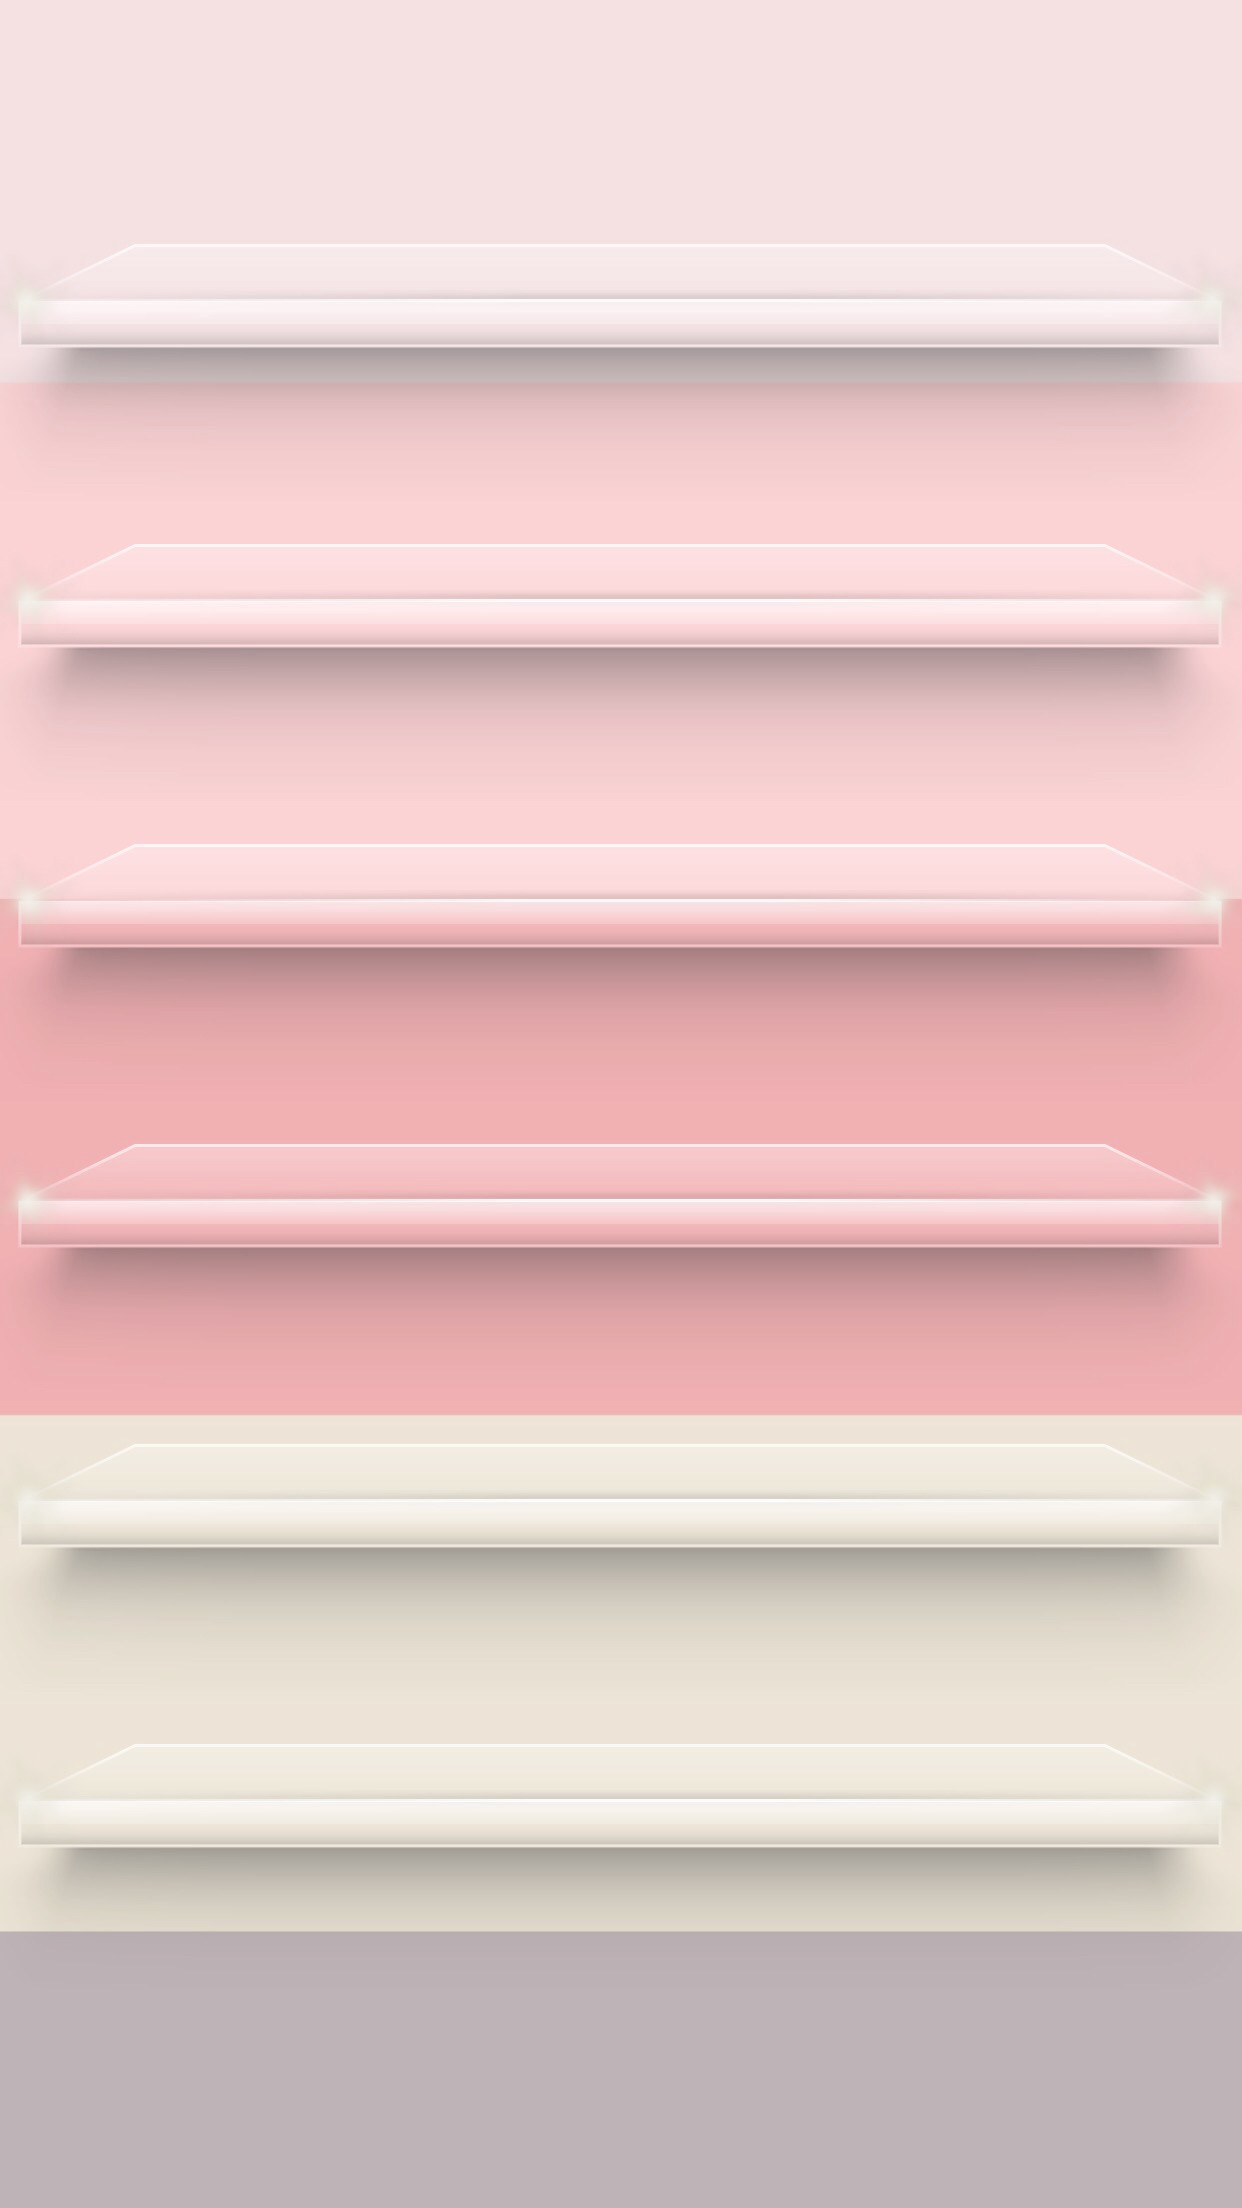 Kawaii Pastel Anime Girl Wallpaper Home Screen Wallpaper For Girls 69 Images